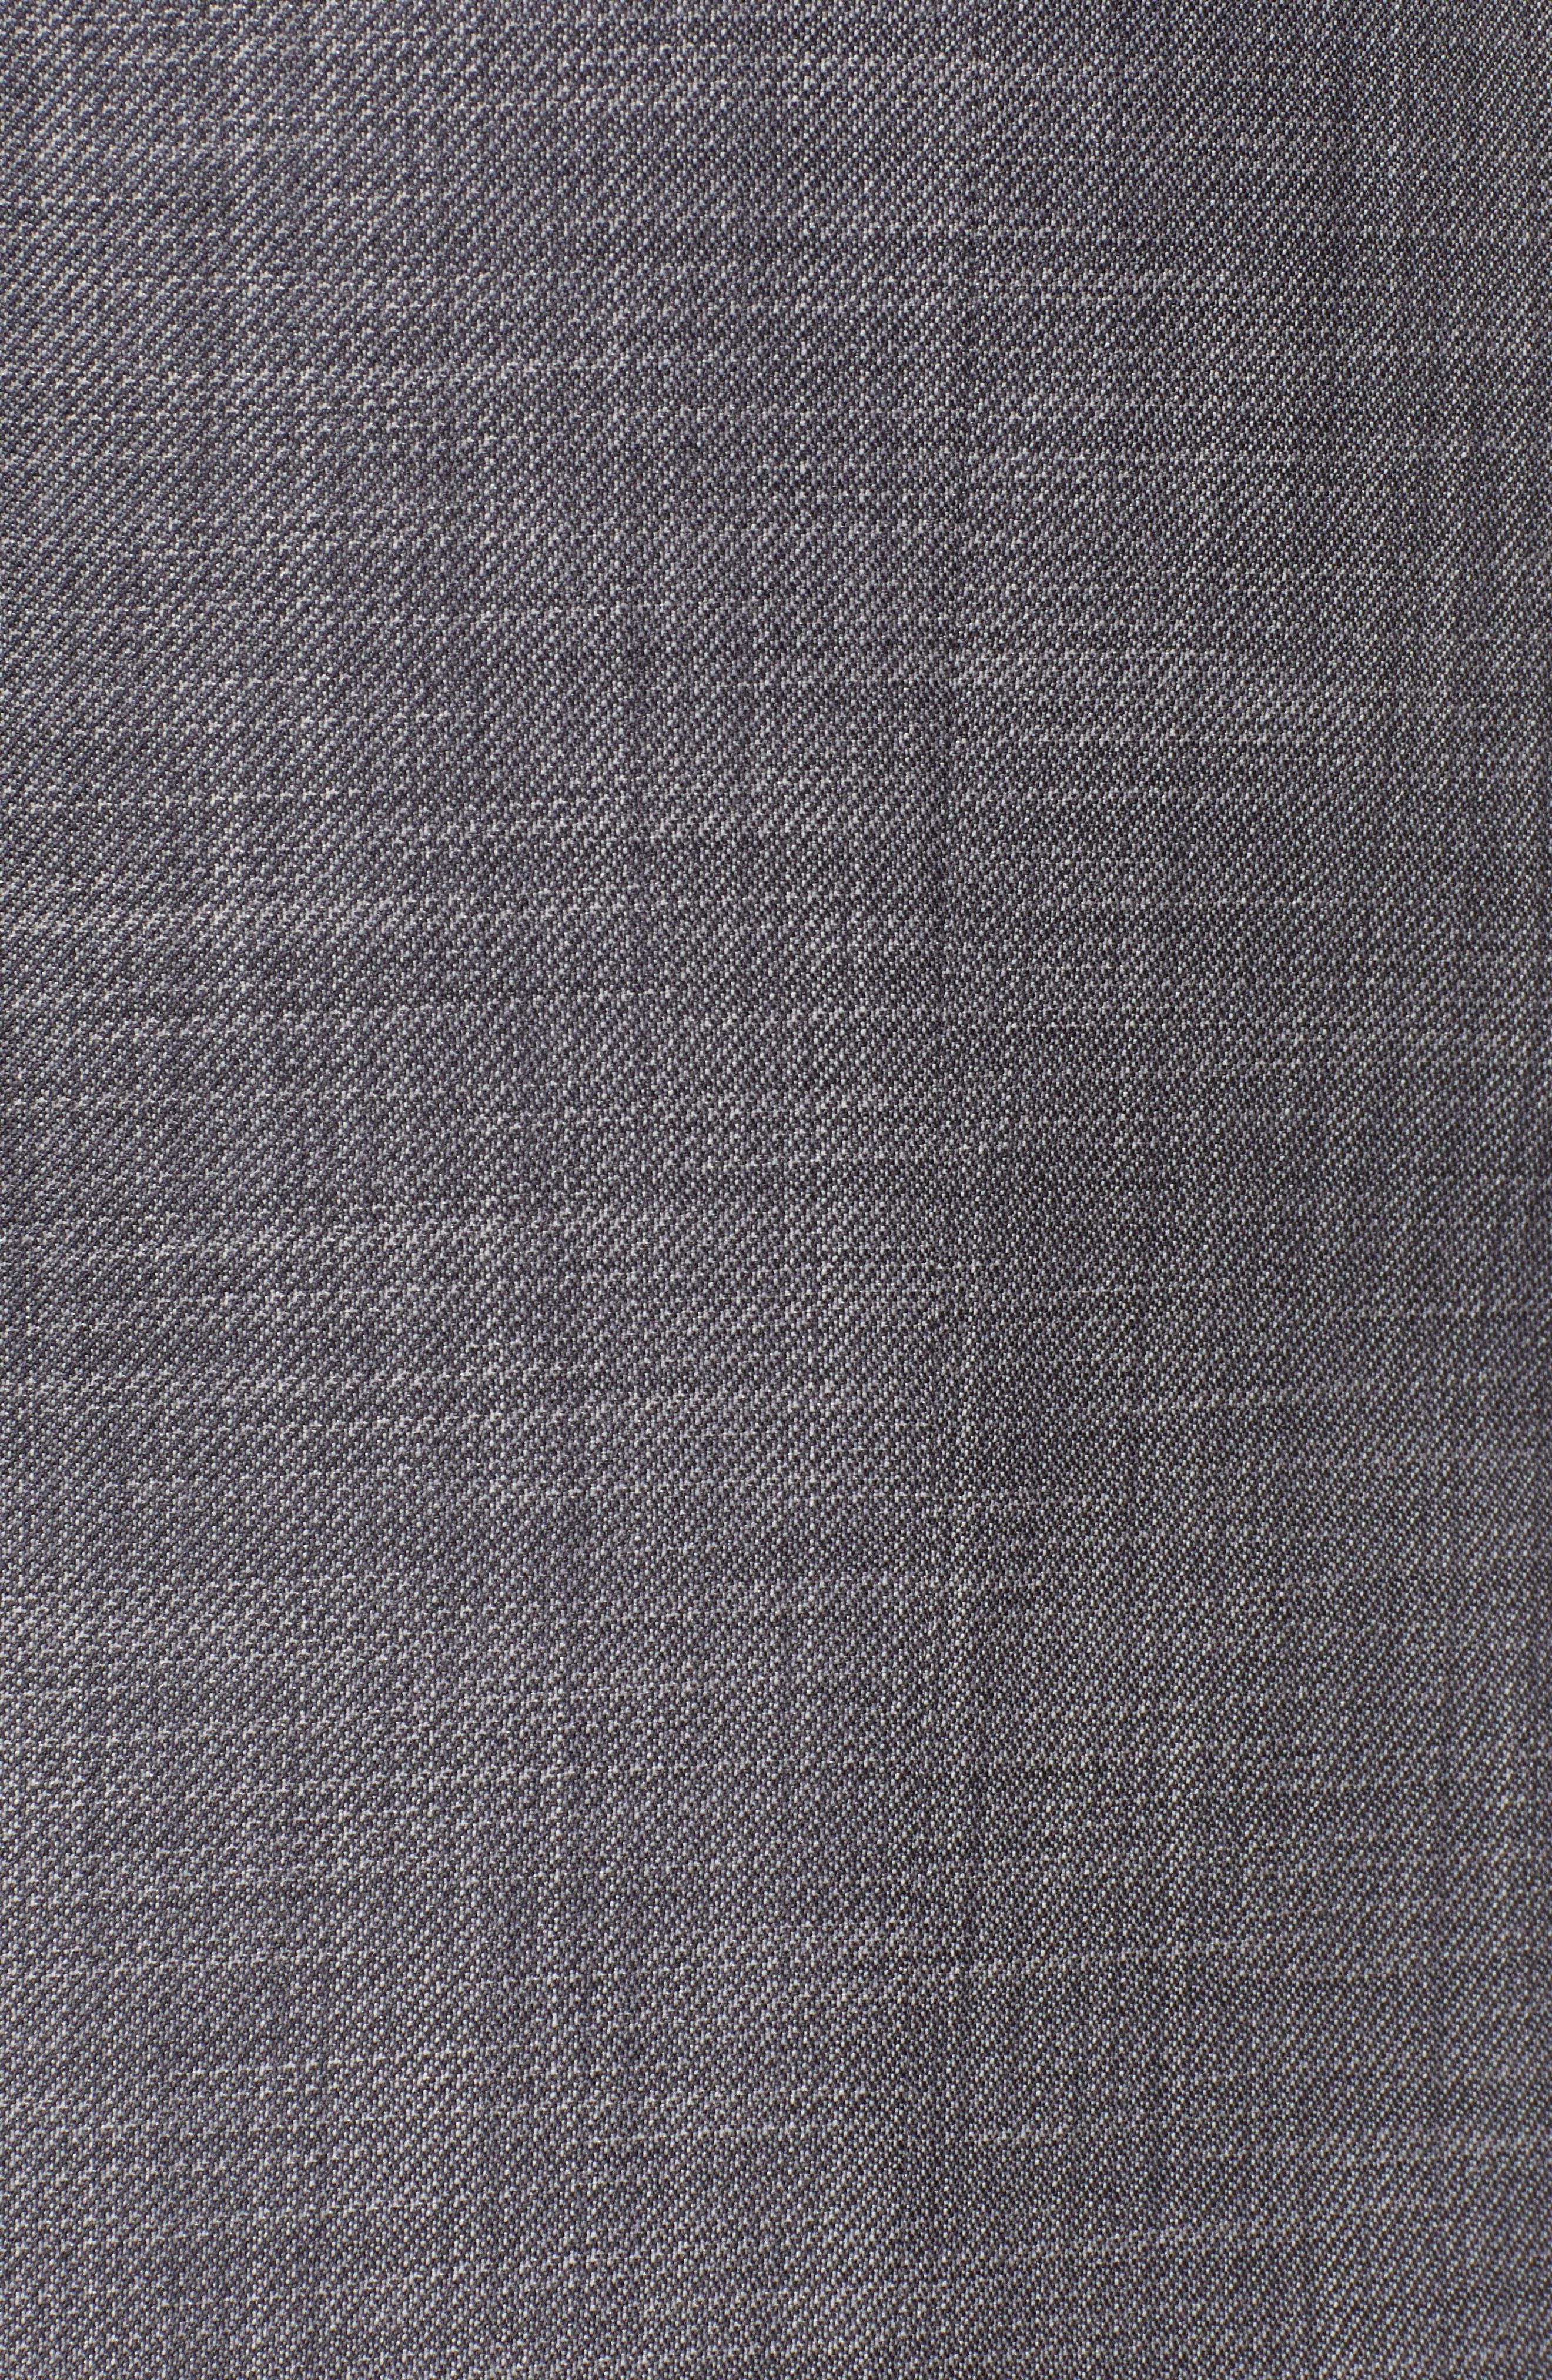 ERMENEGILDO ZEGNA, Milano Trim Fit Solid Wool & Silk Suit, Alternate thumbnail 7, color, GREY